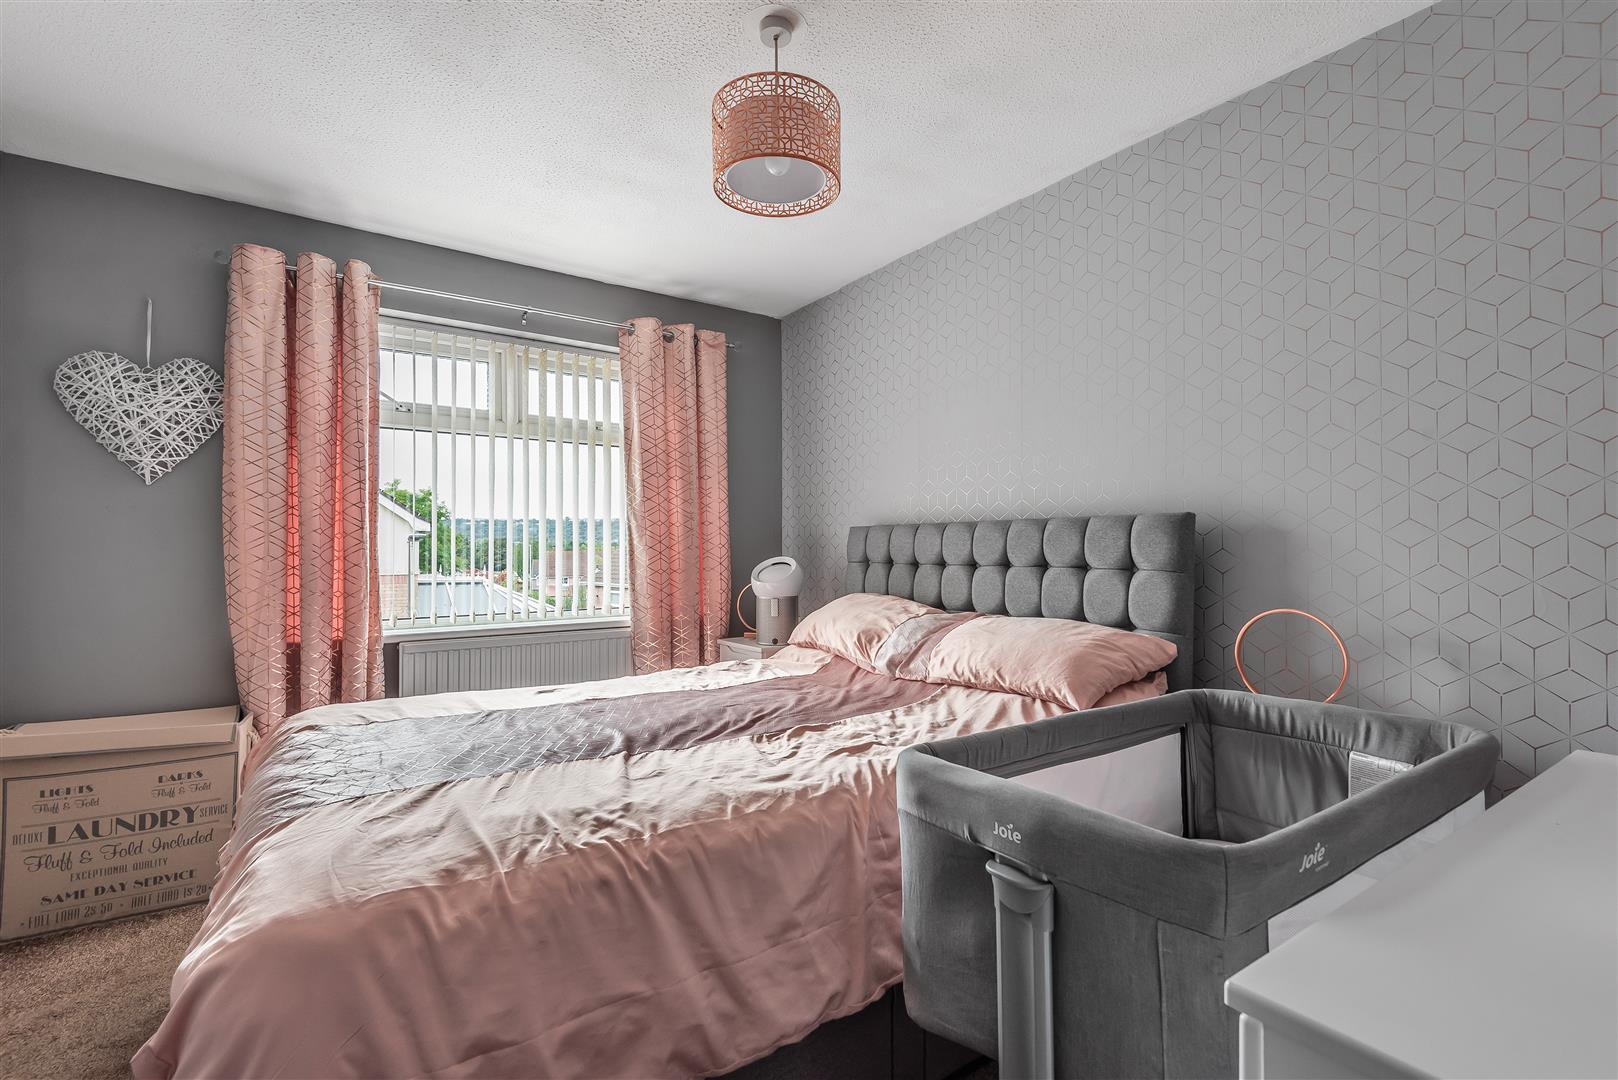 Midland Place, Llansamlet, Swansea, SA7 9QU